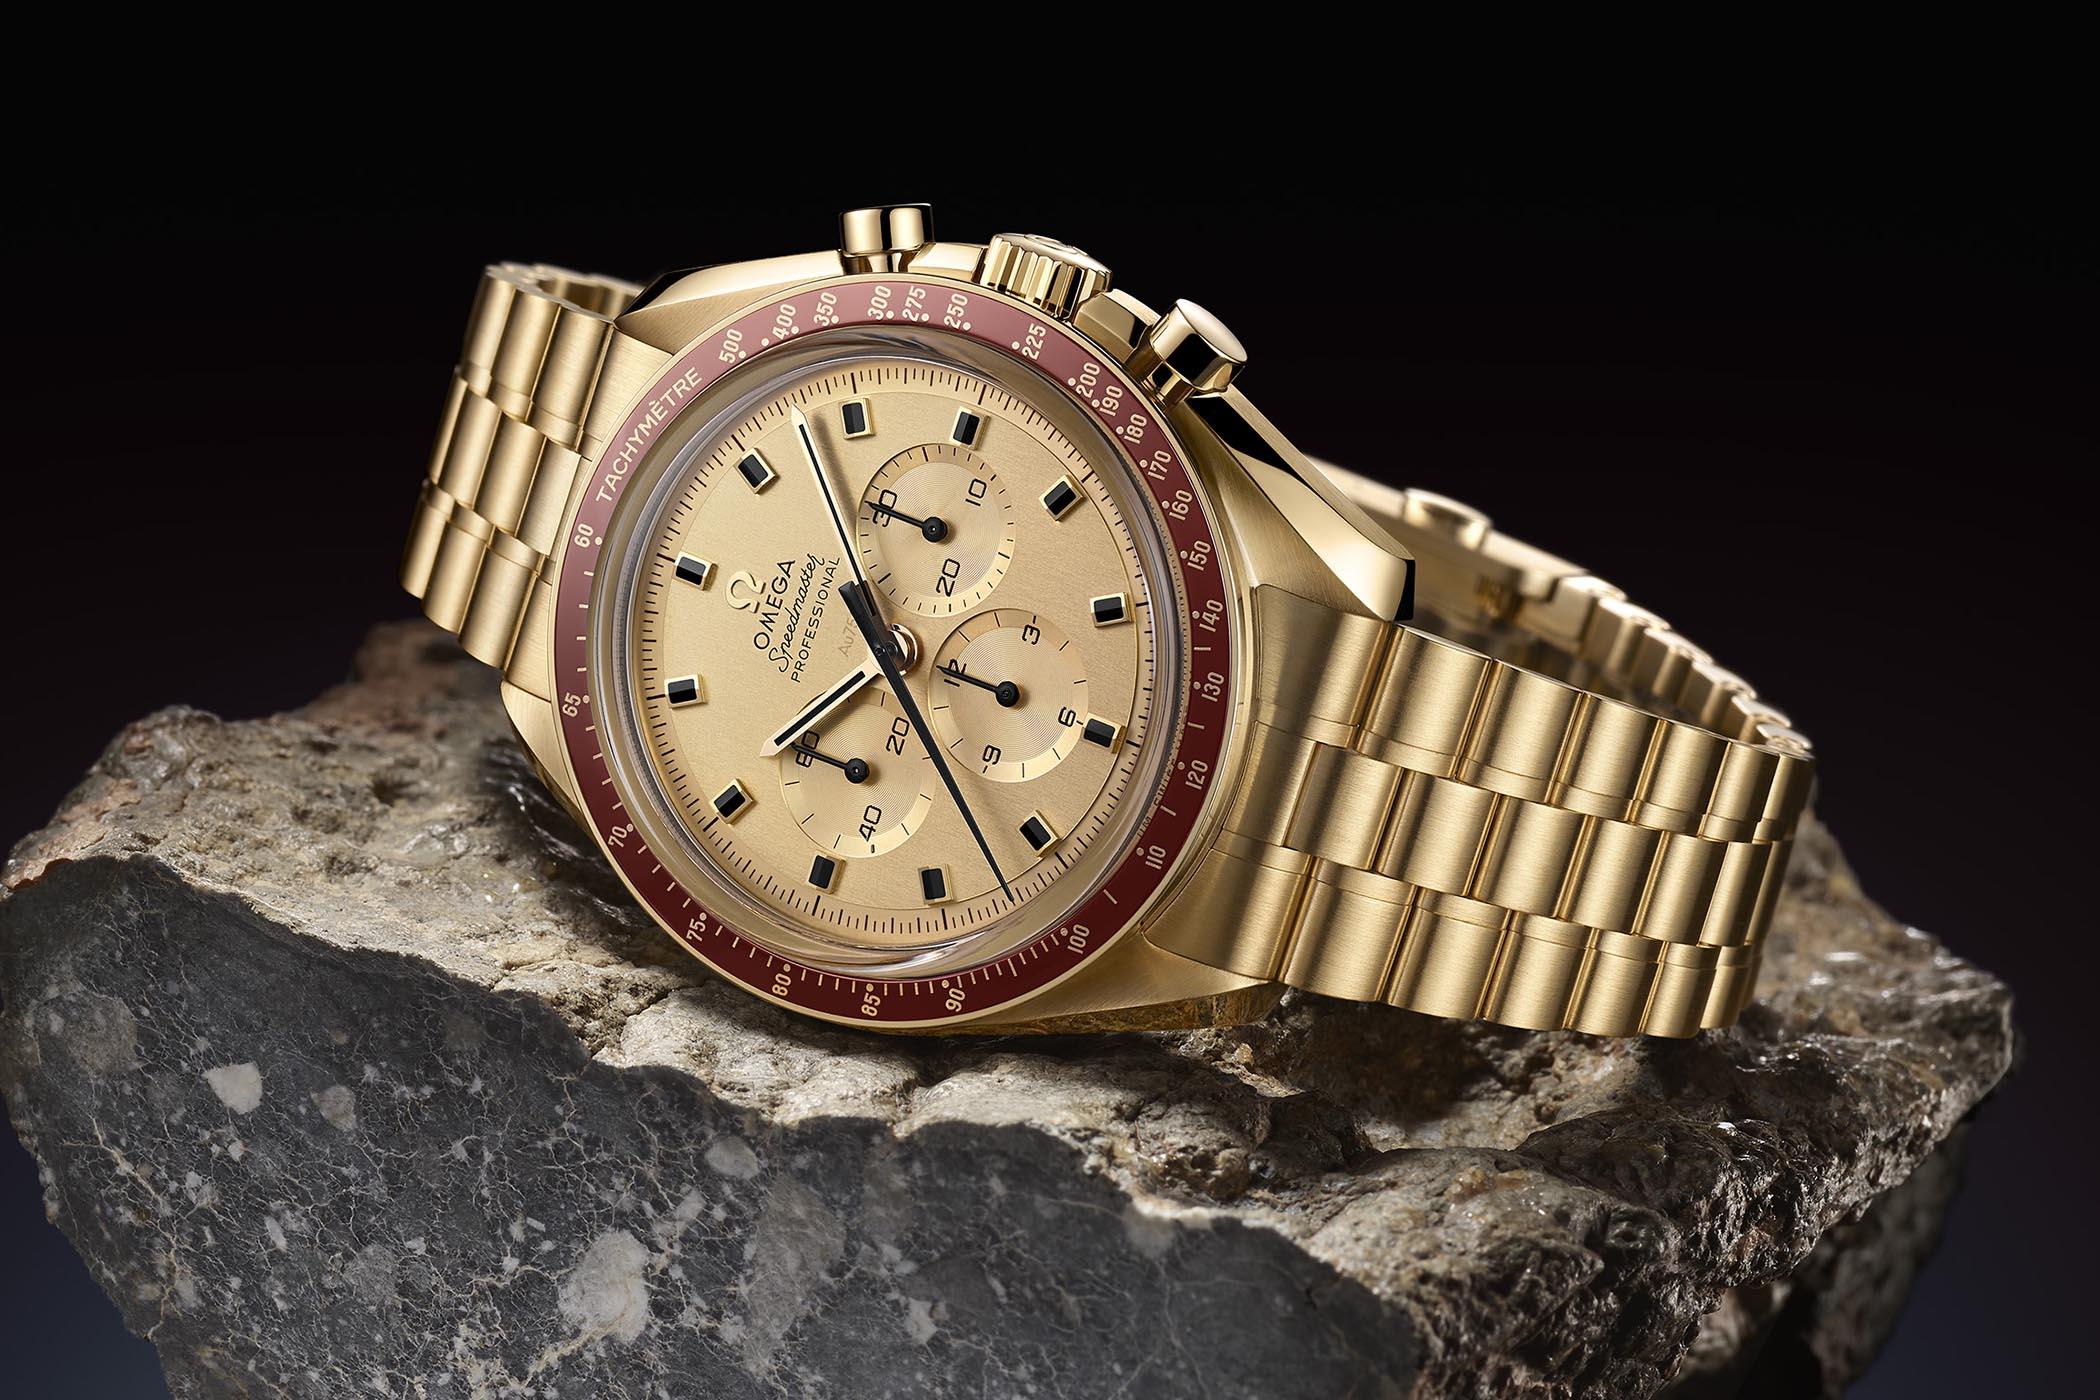 Omega Speedmaster Apollo 11 50th Anniversary Limited Edition 310.60.42.50.99.001